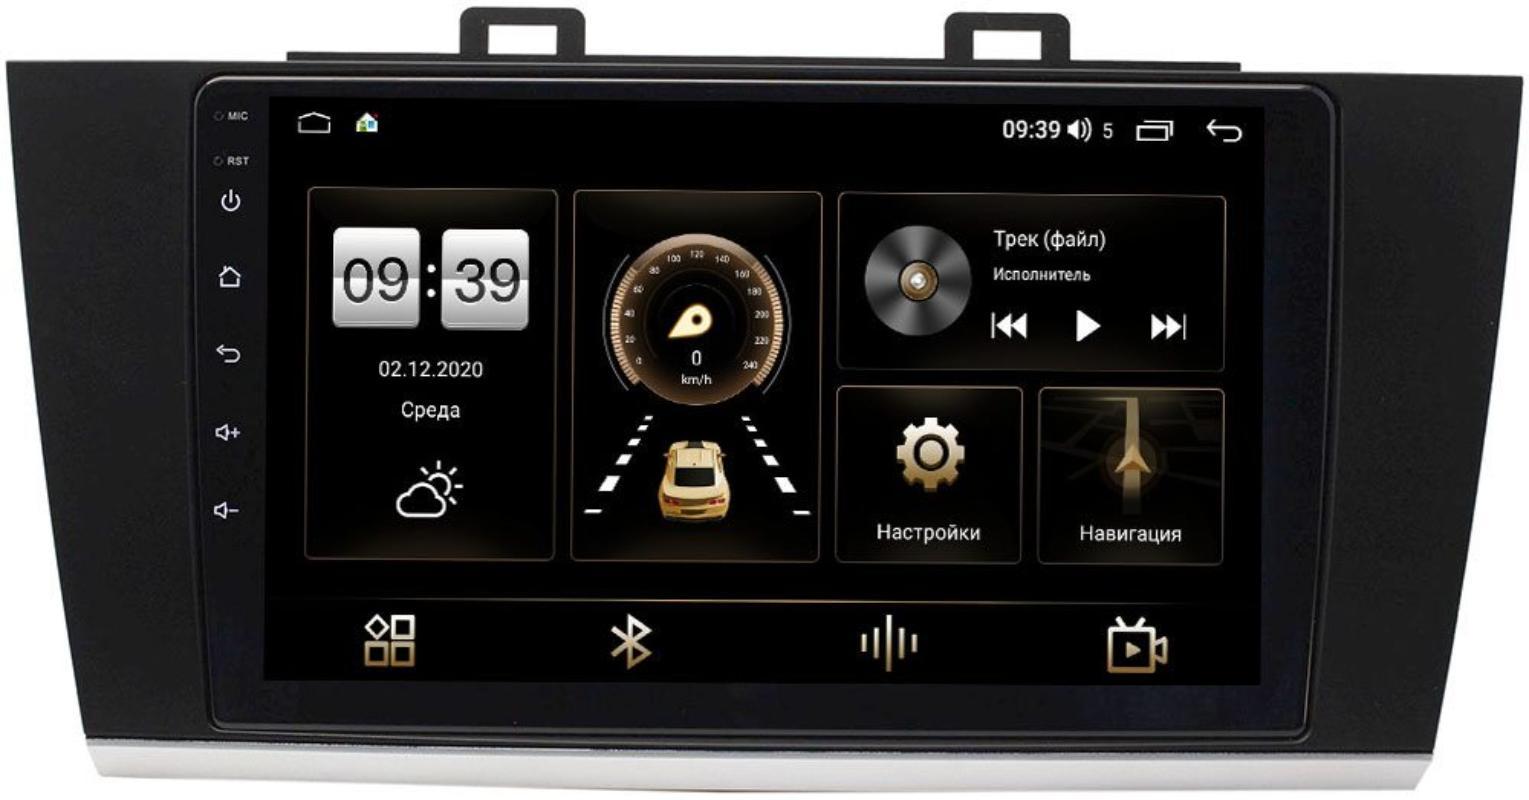 Штатная магнитола LeTrun 4166-9192 для Subaru Legacy VI, Outback V 2014-2019 на Android 10 (4G-SIM, 3/32, DSP, QLed) (+ Камера заднего вида в подарок!)